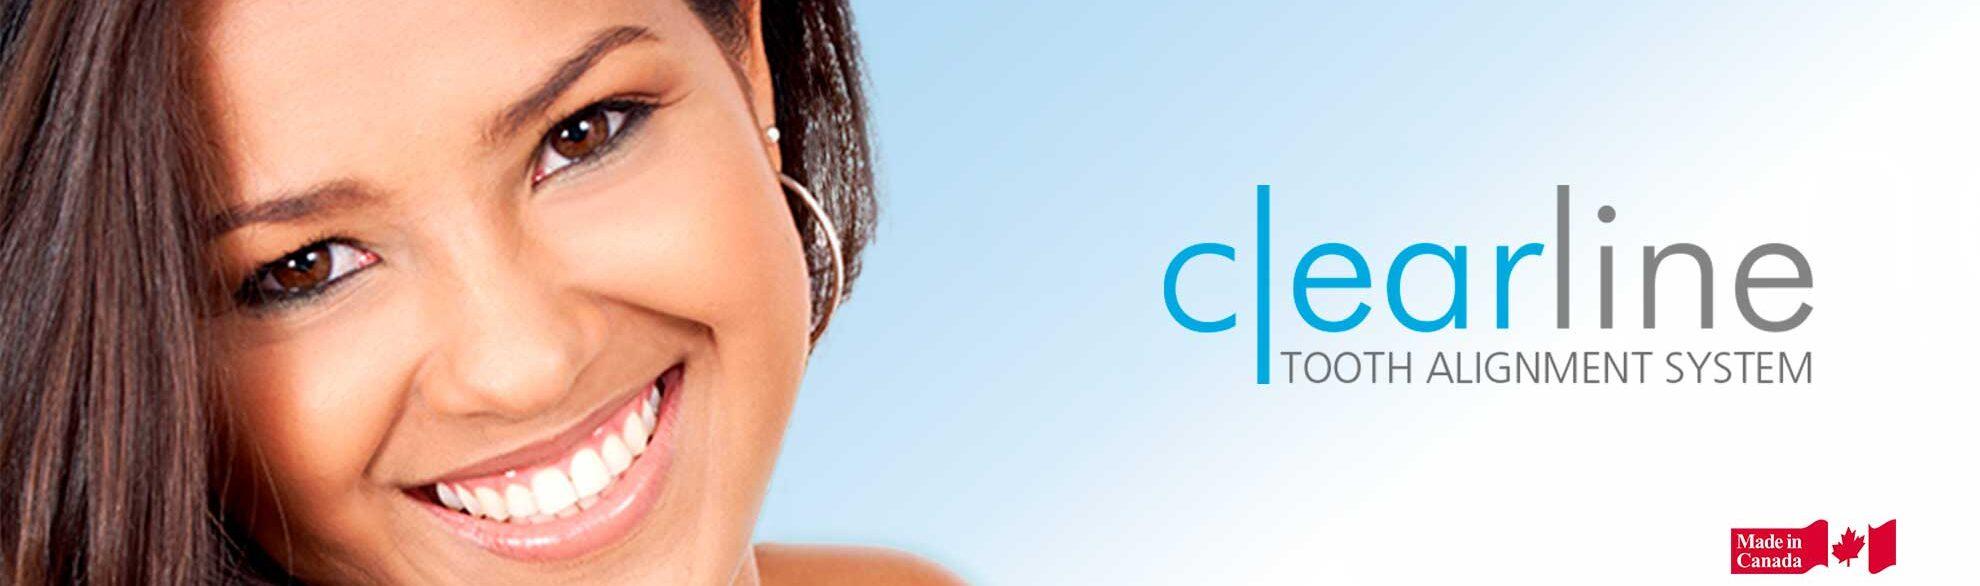 Clearline-bannerMainWoman